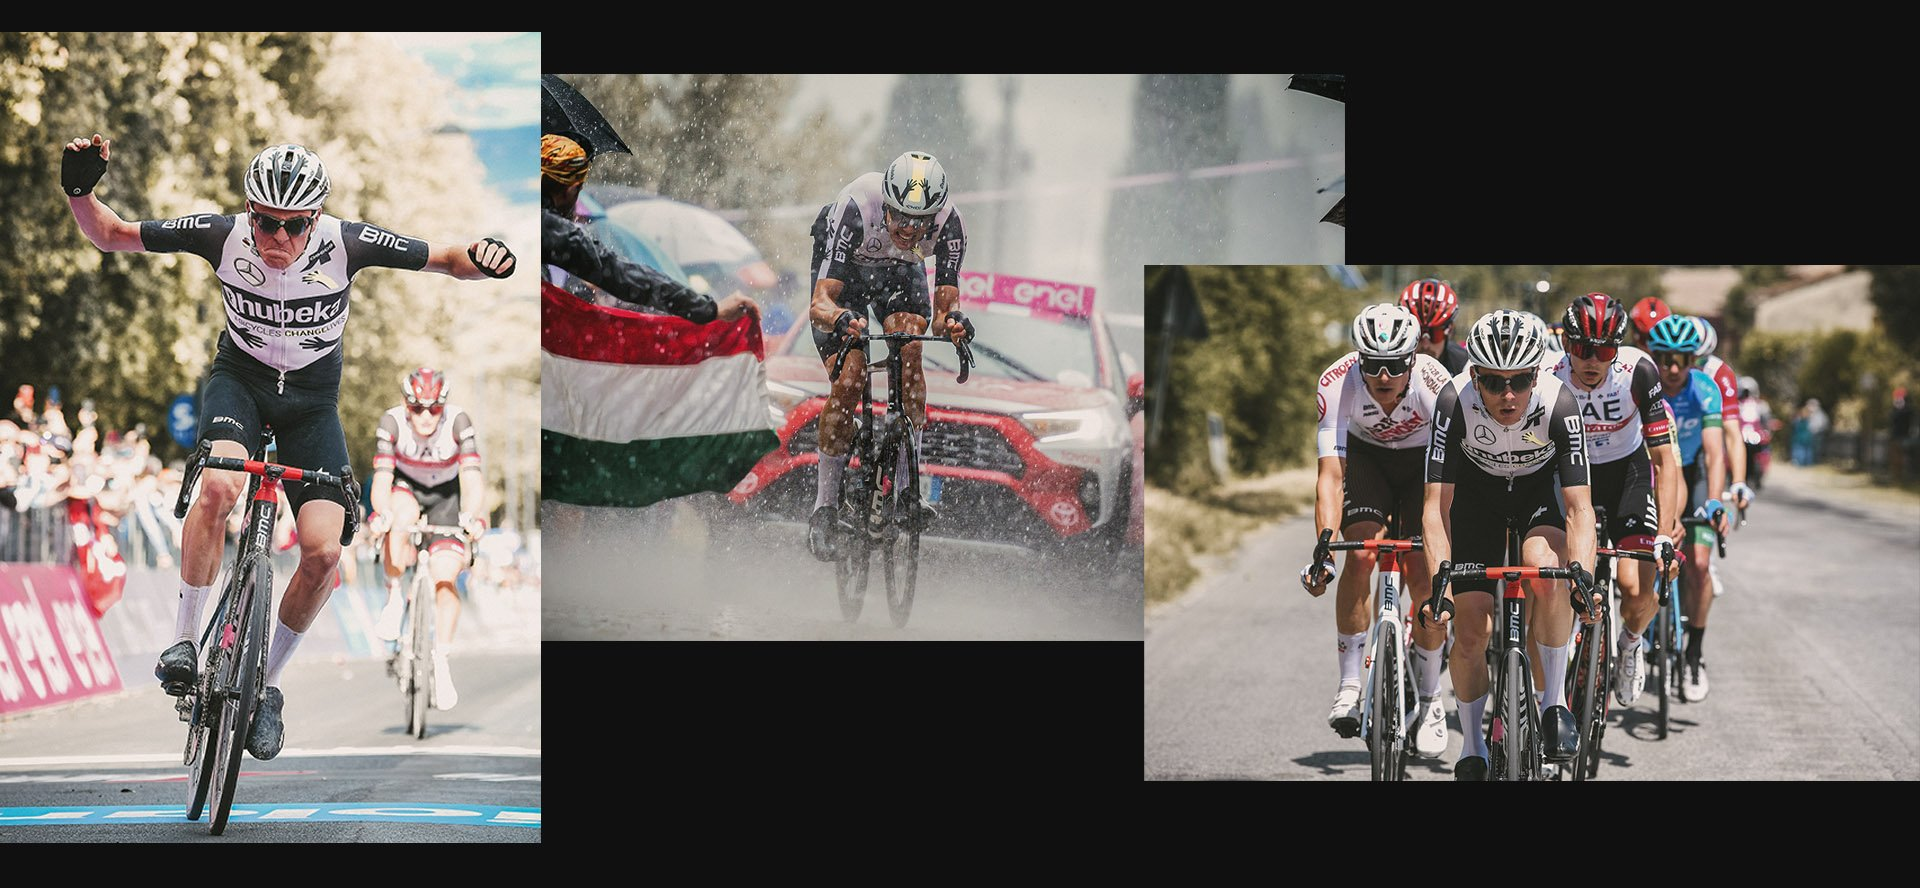 Colour photo of Qhubeka ASSOS & Goodyear Bike